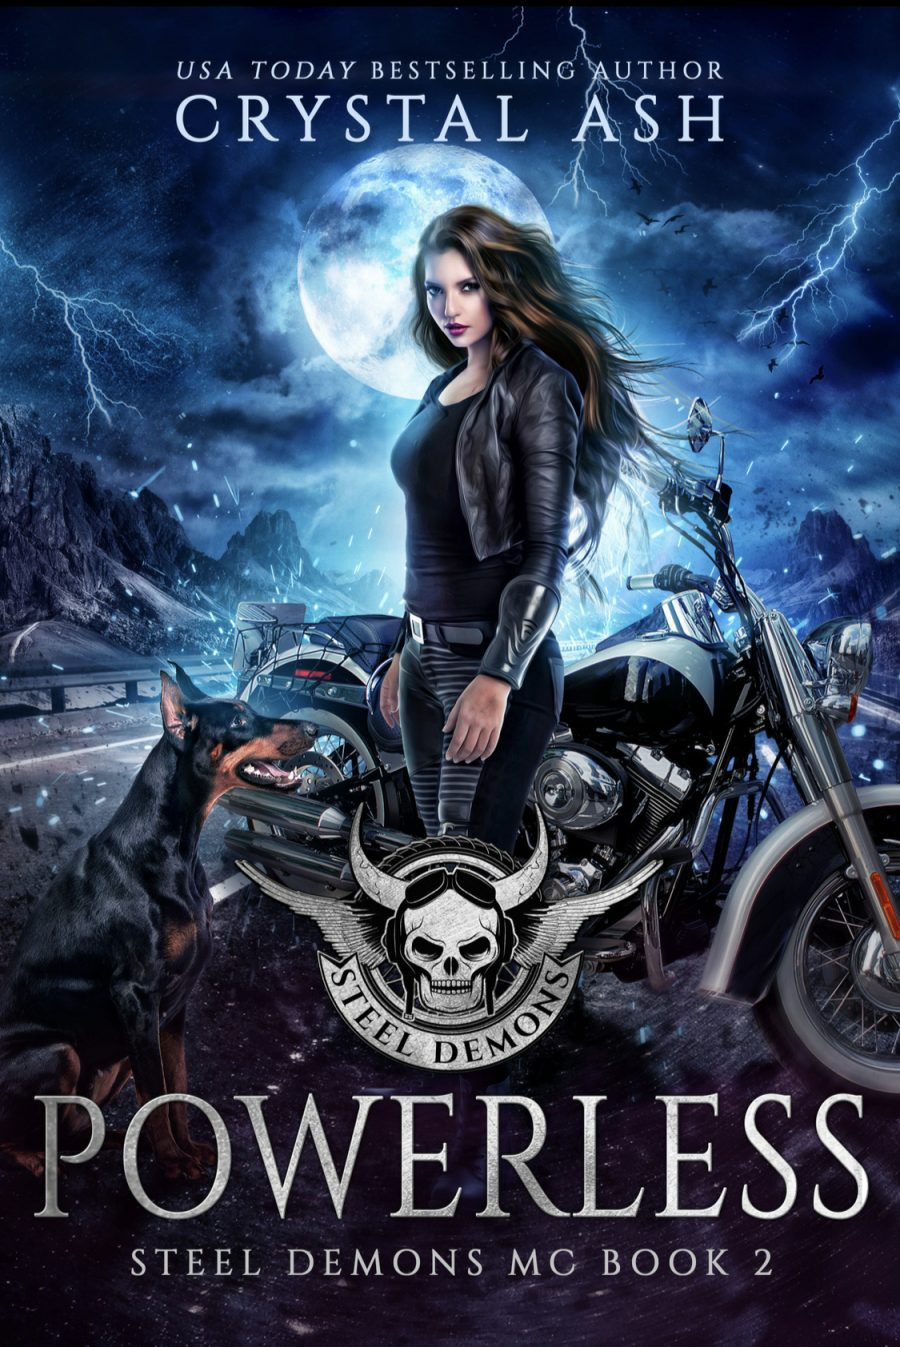 Powerless by Crystal Ask - A Book Review #BookReview #SlowBurn #RH #MC #Dystopian #PNR #Book2 #KindleUnlimited #KU